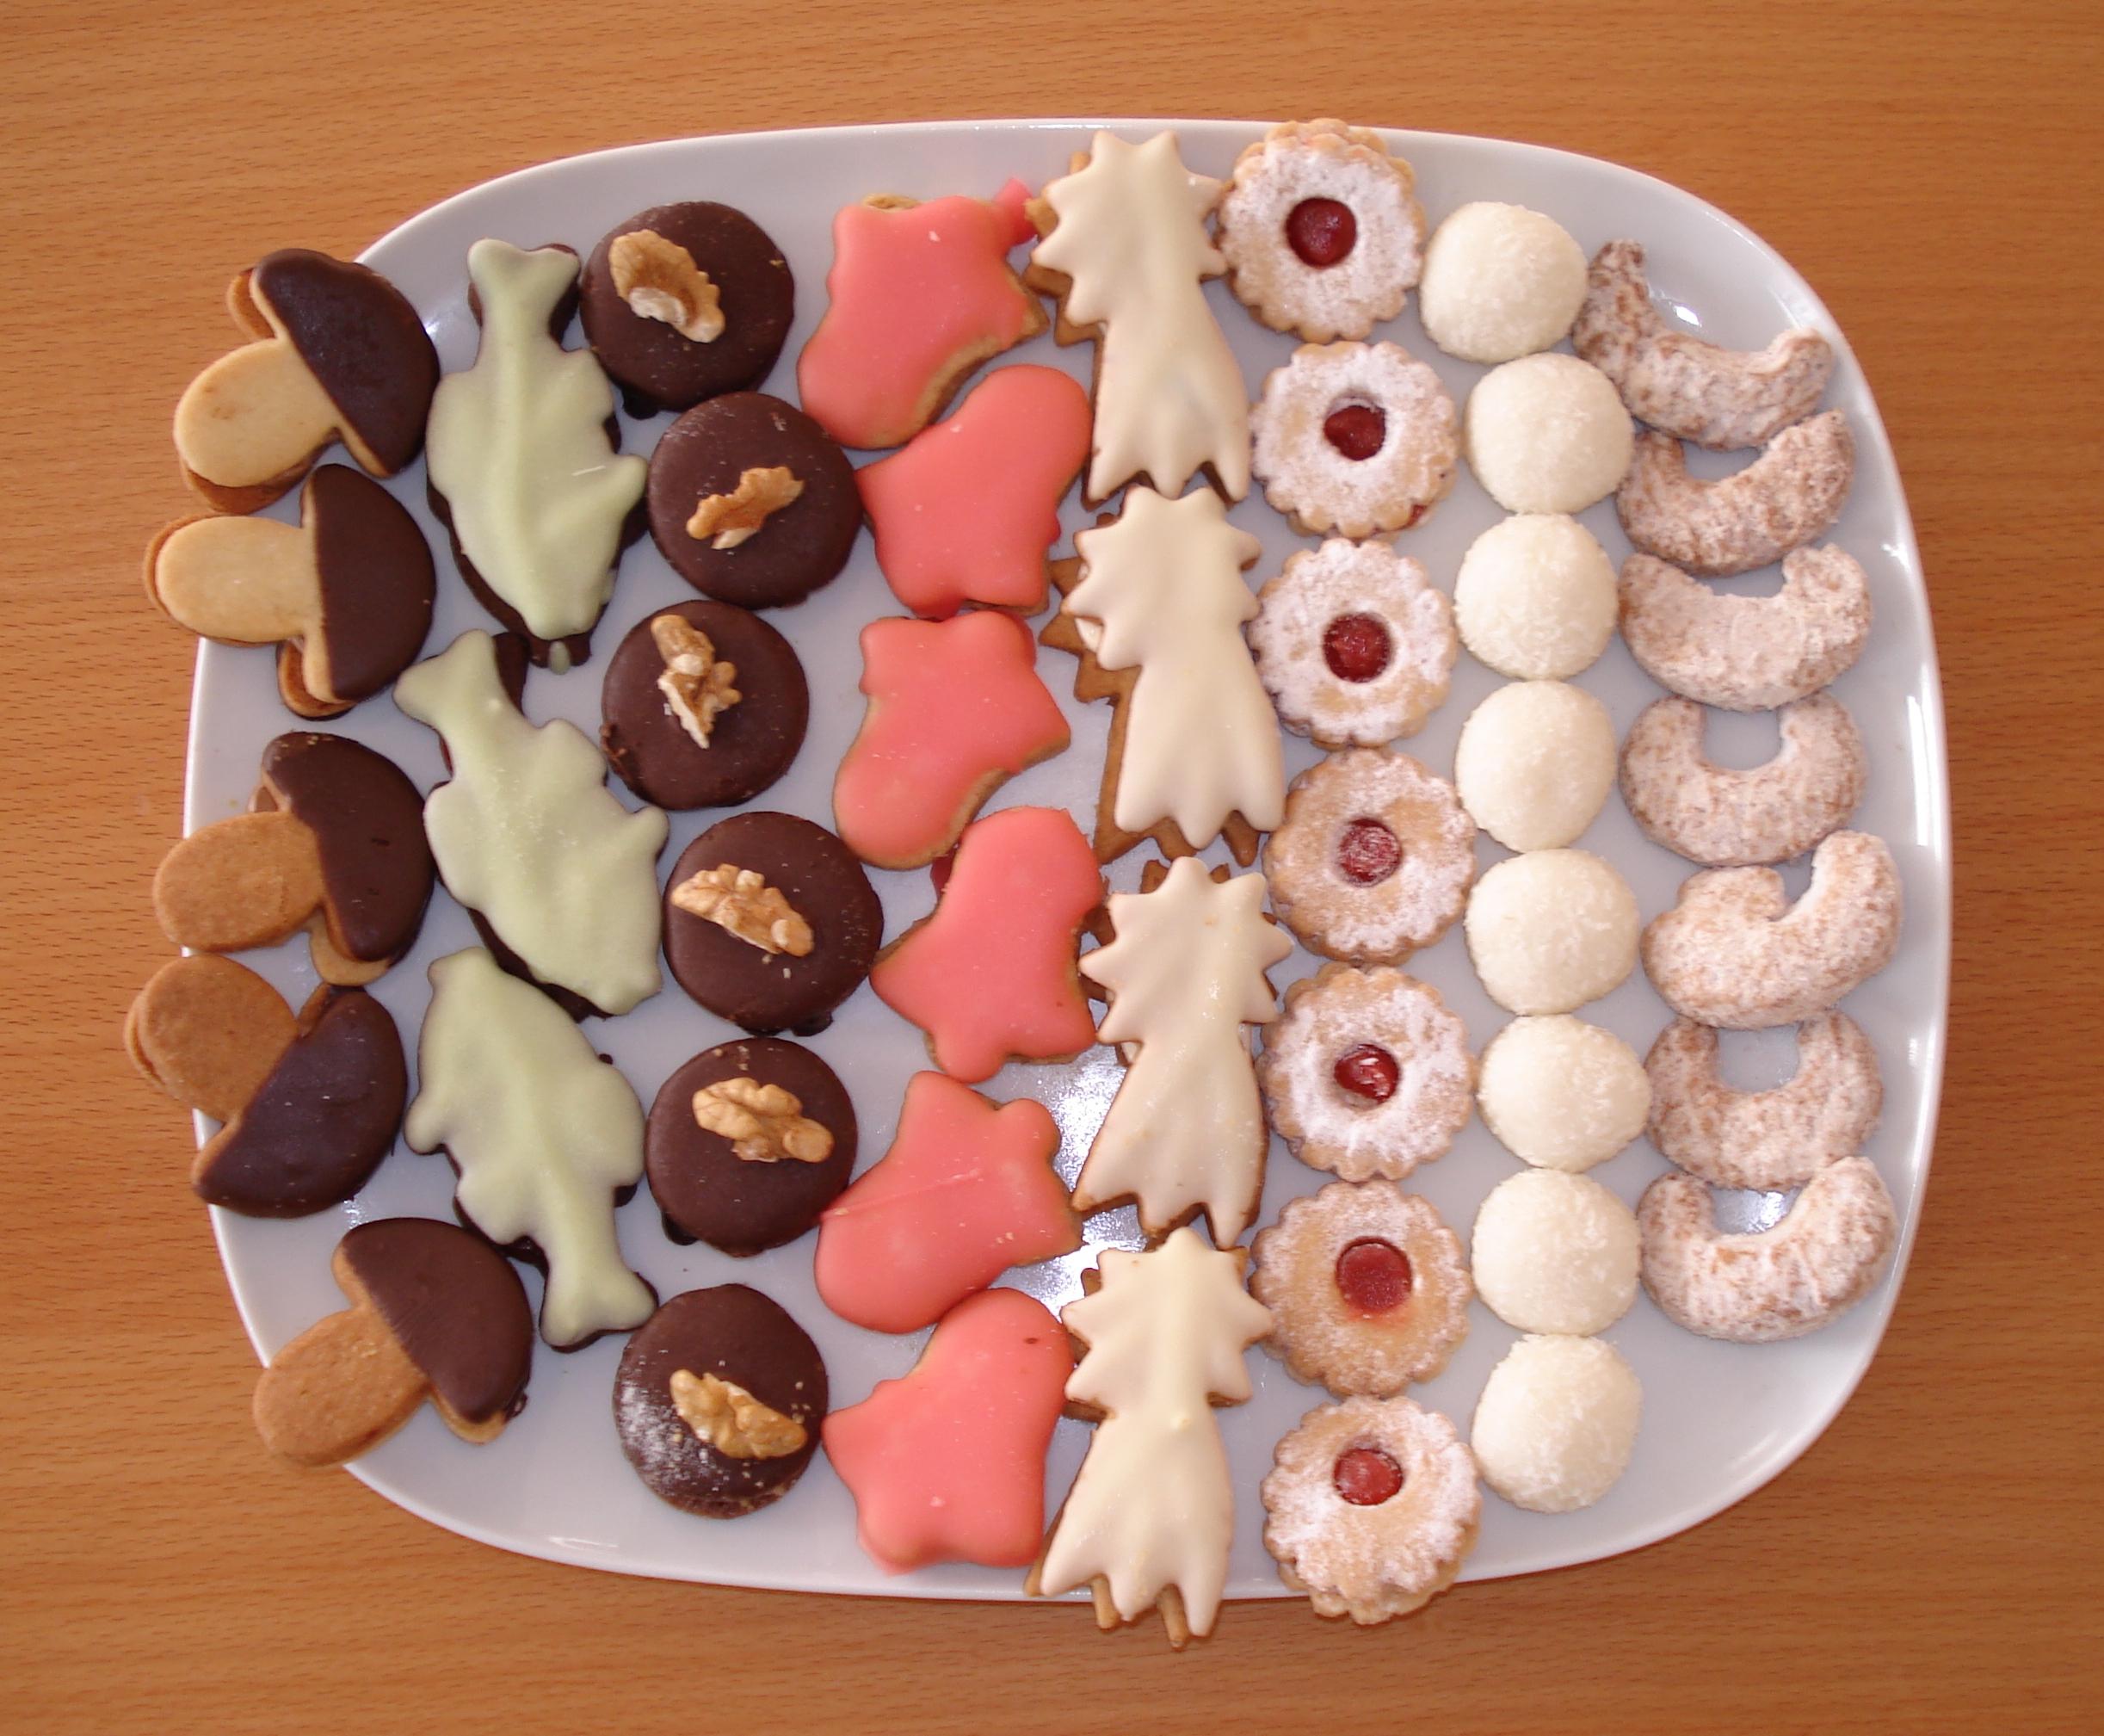 File:Vanocni cukrovi 1.JPG - Wikimedia Commons